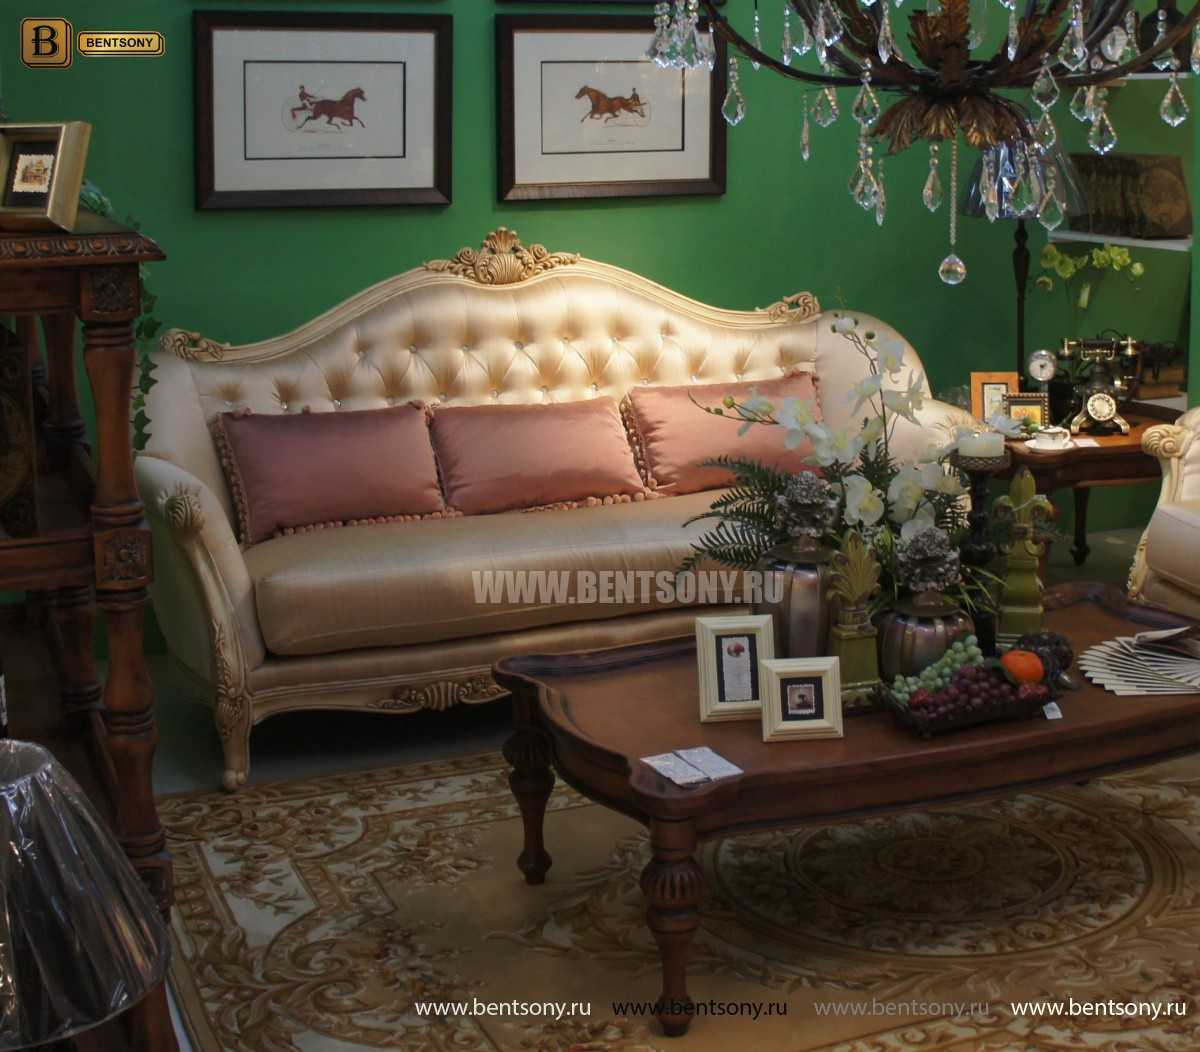 Диван Феникс С (Классика, Ткань) каталог мебели с ценами